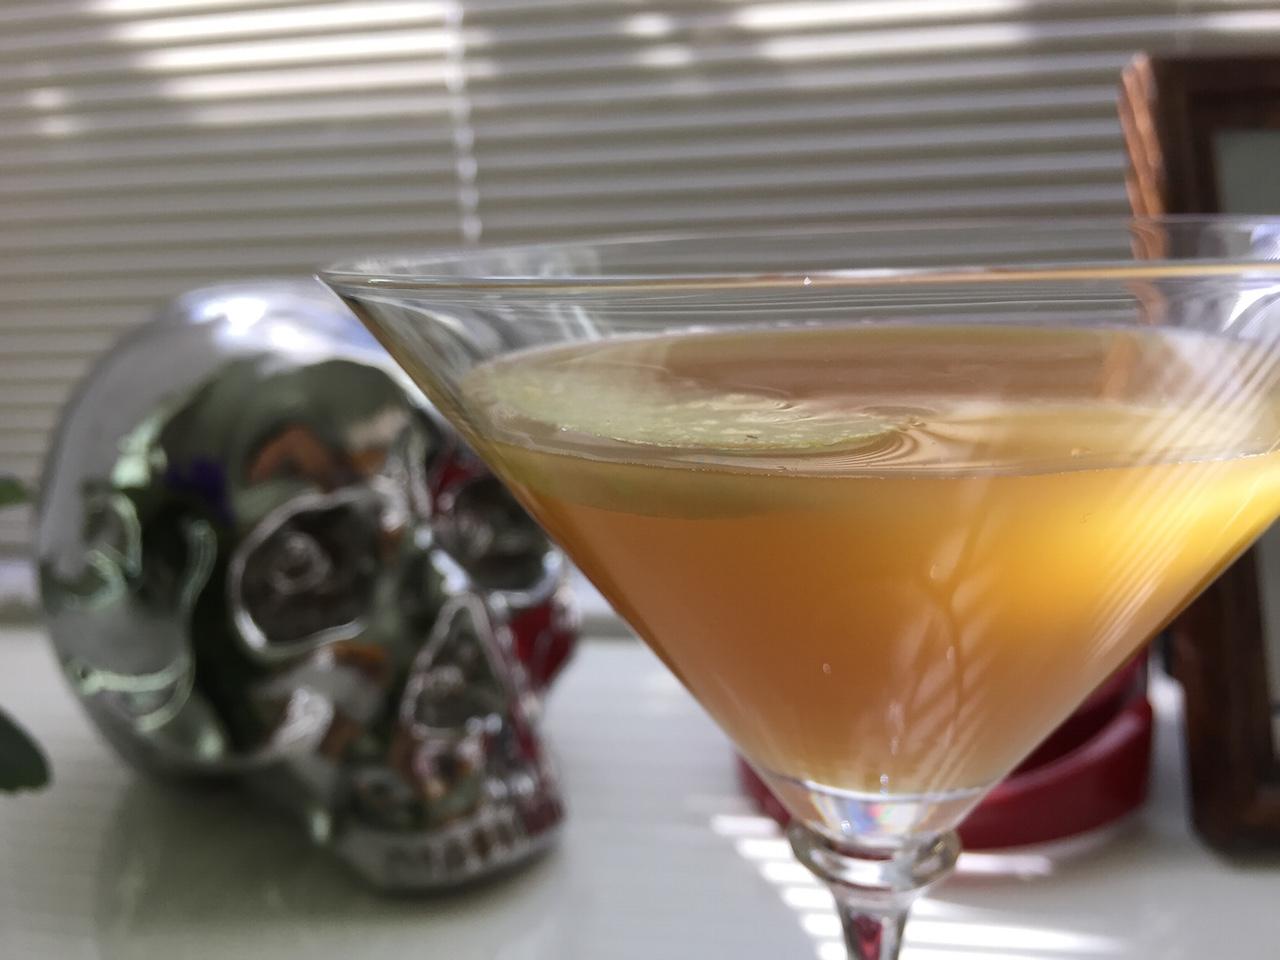 Thanksgiving 'Signature Drink' : Apple Cidercar